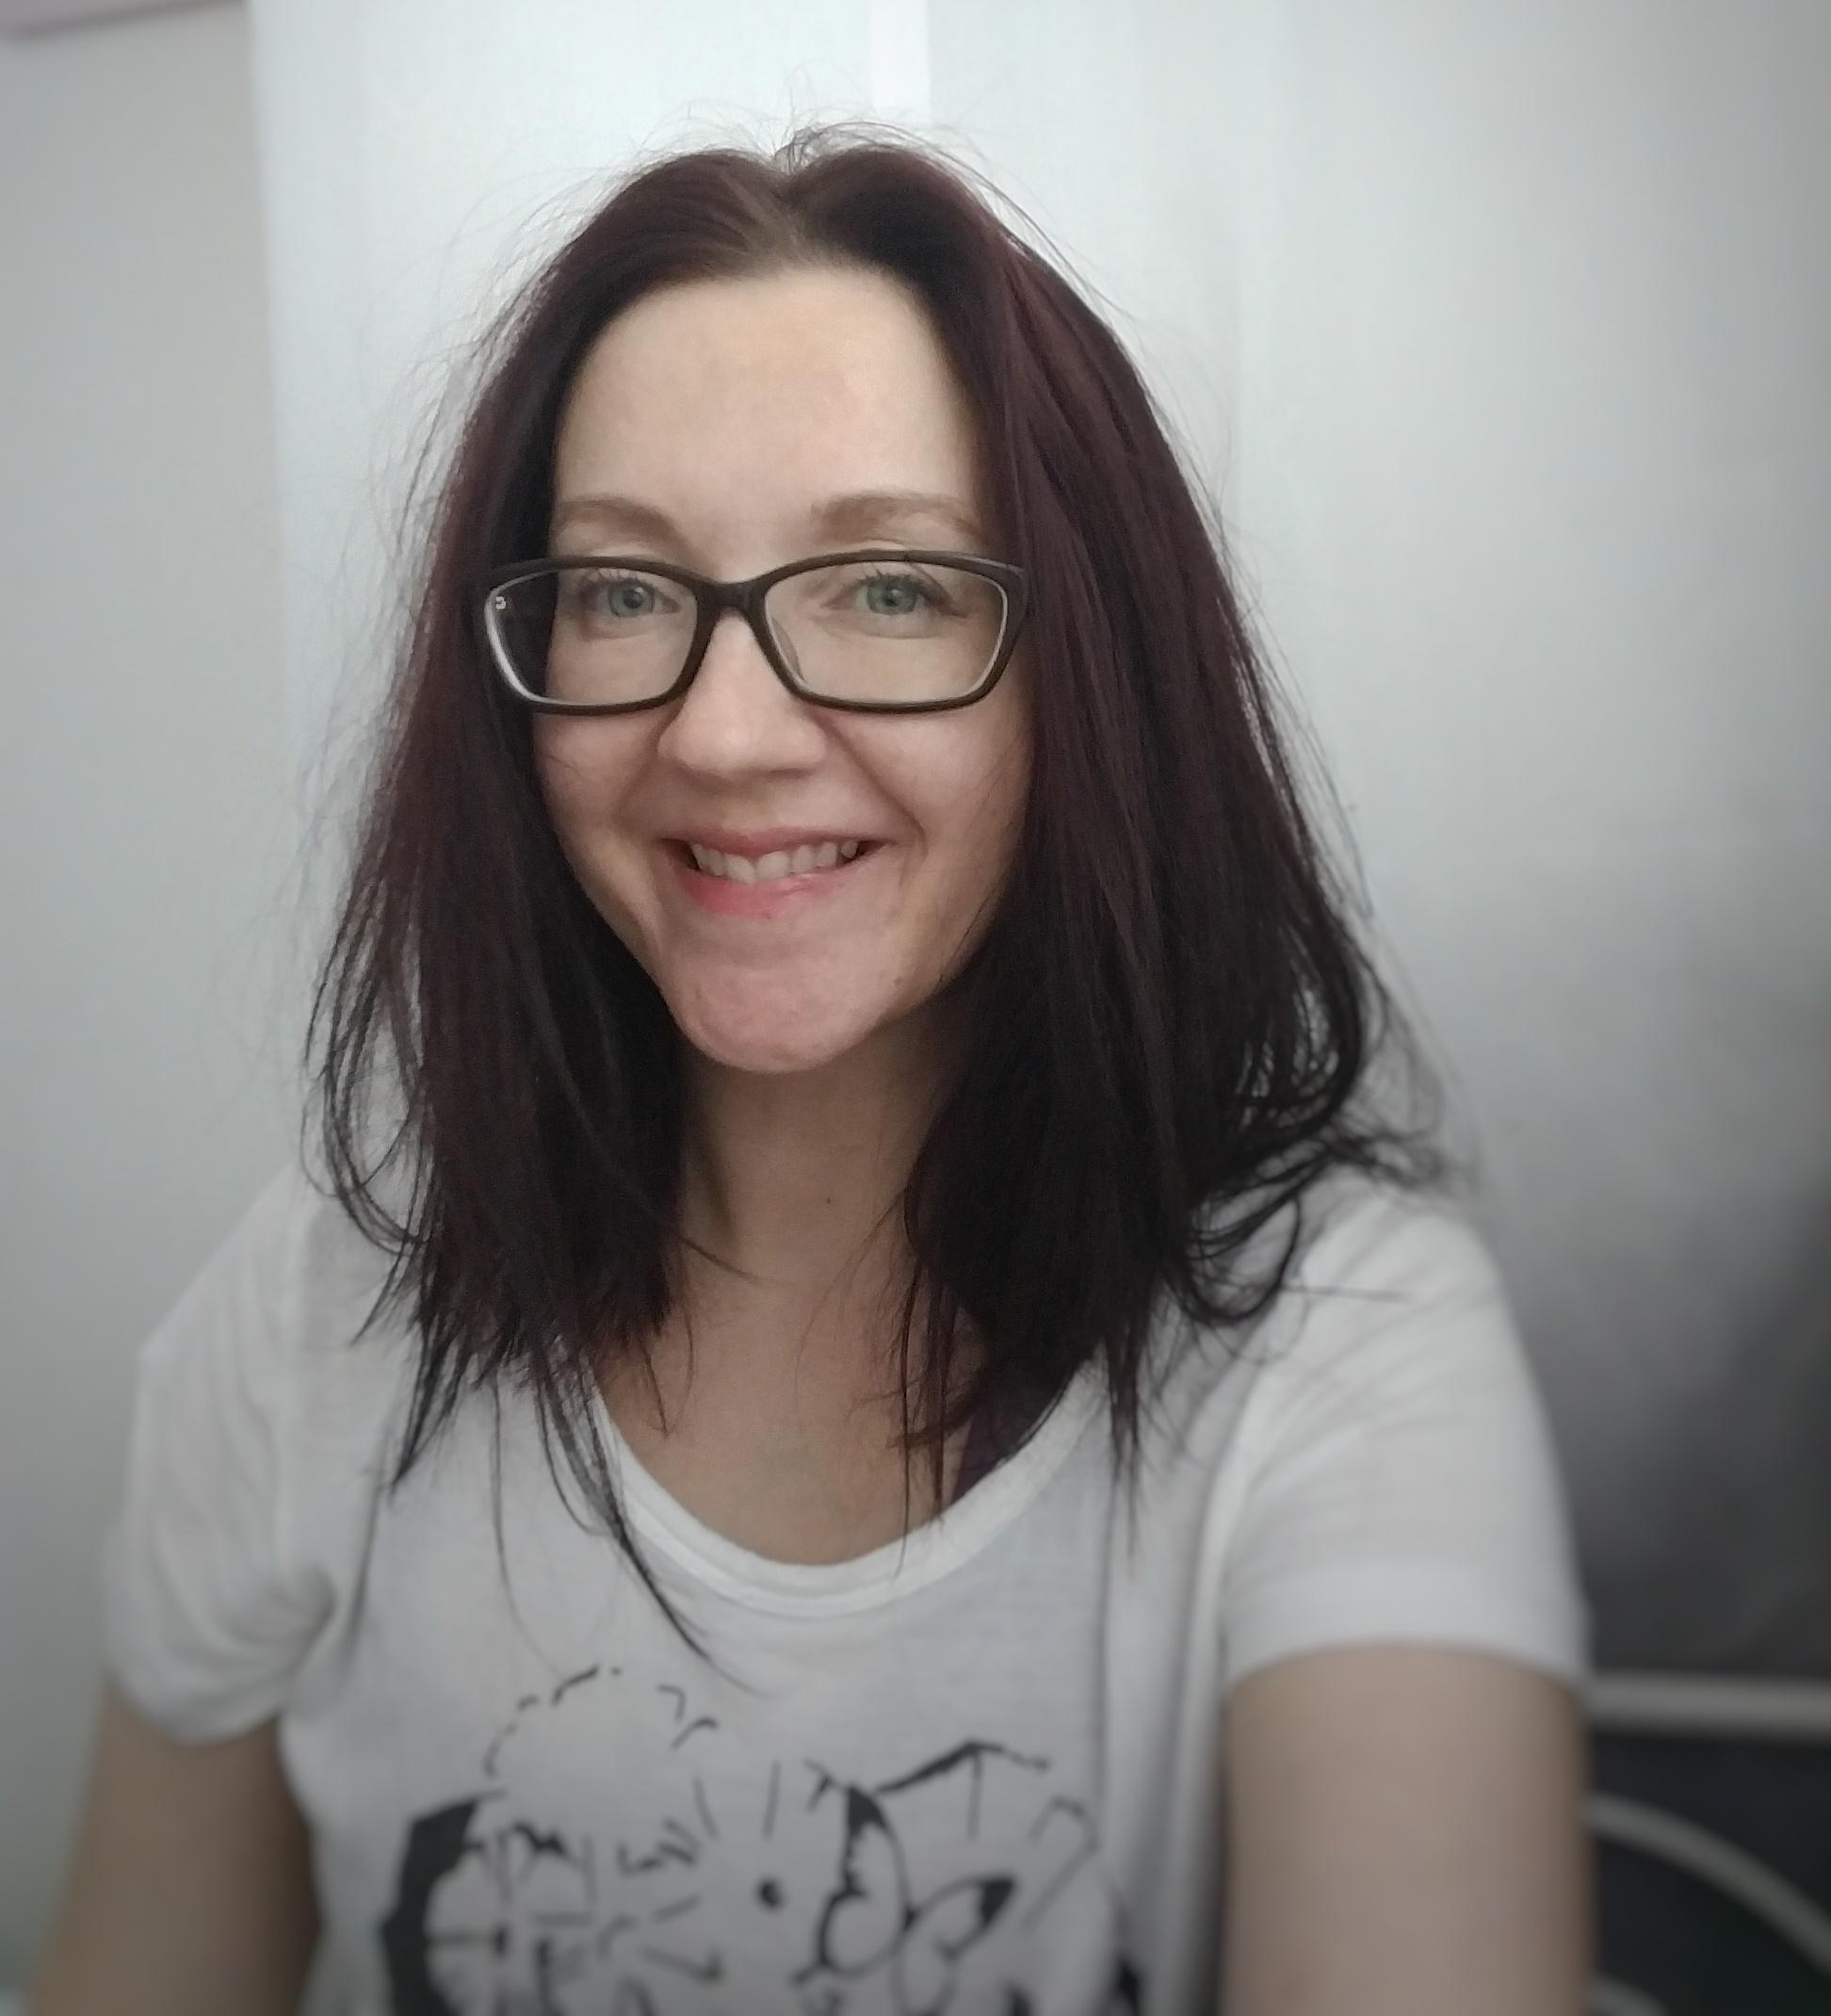 Johanna Haliseva